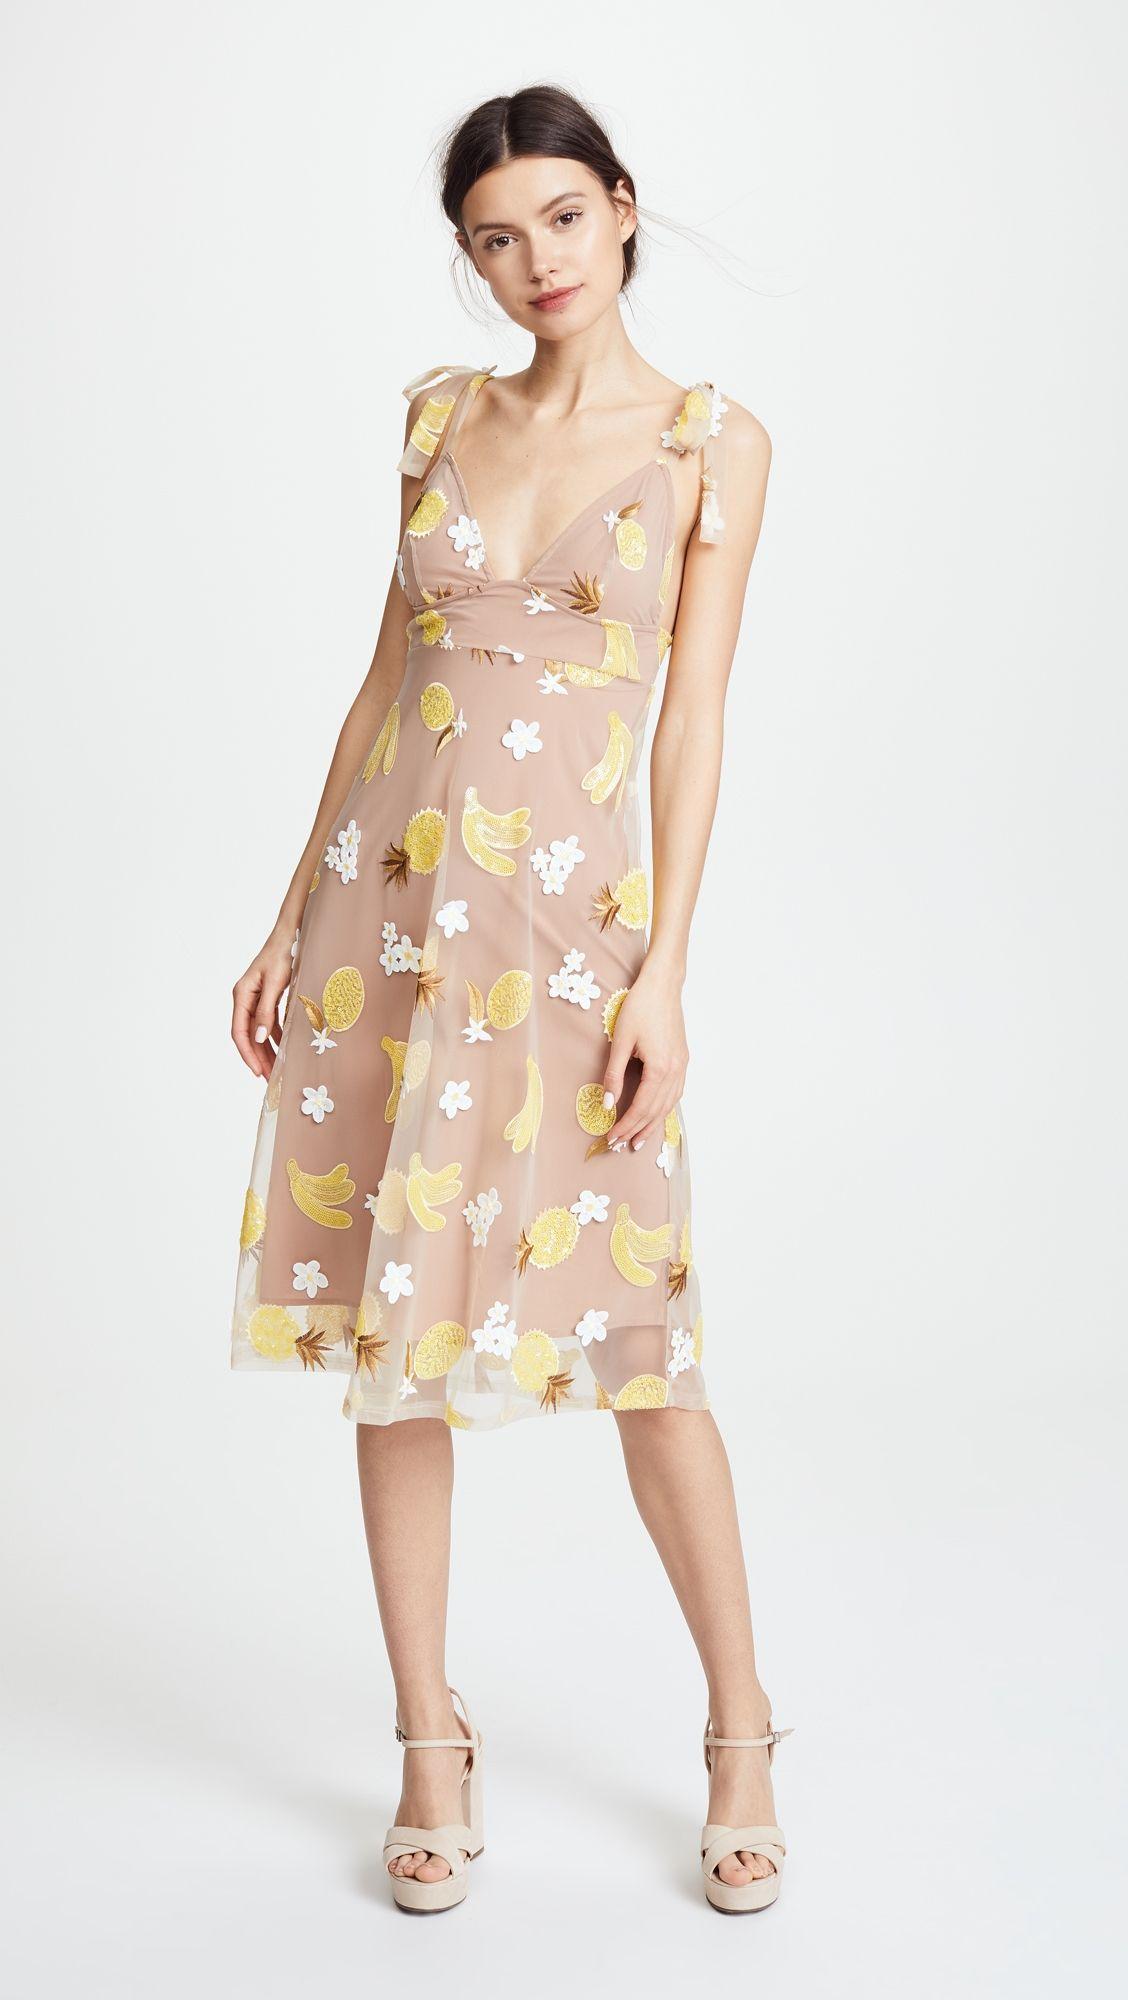 ee11882f2374 Fruitpunch Sequin Midi Dress | Products | Sequin midi dress, Dresses ...